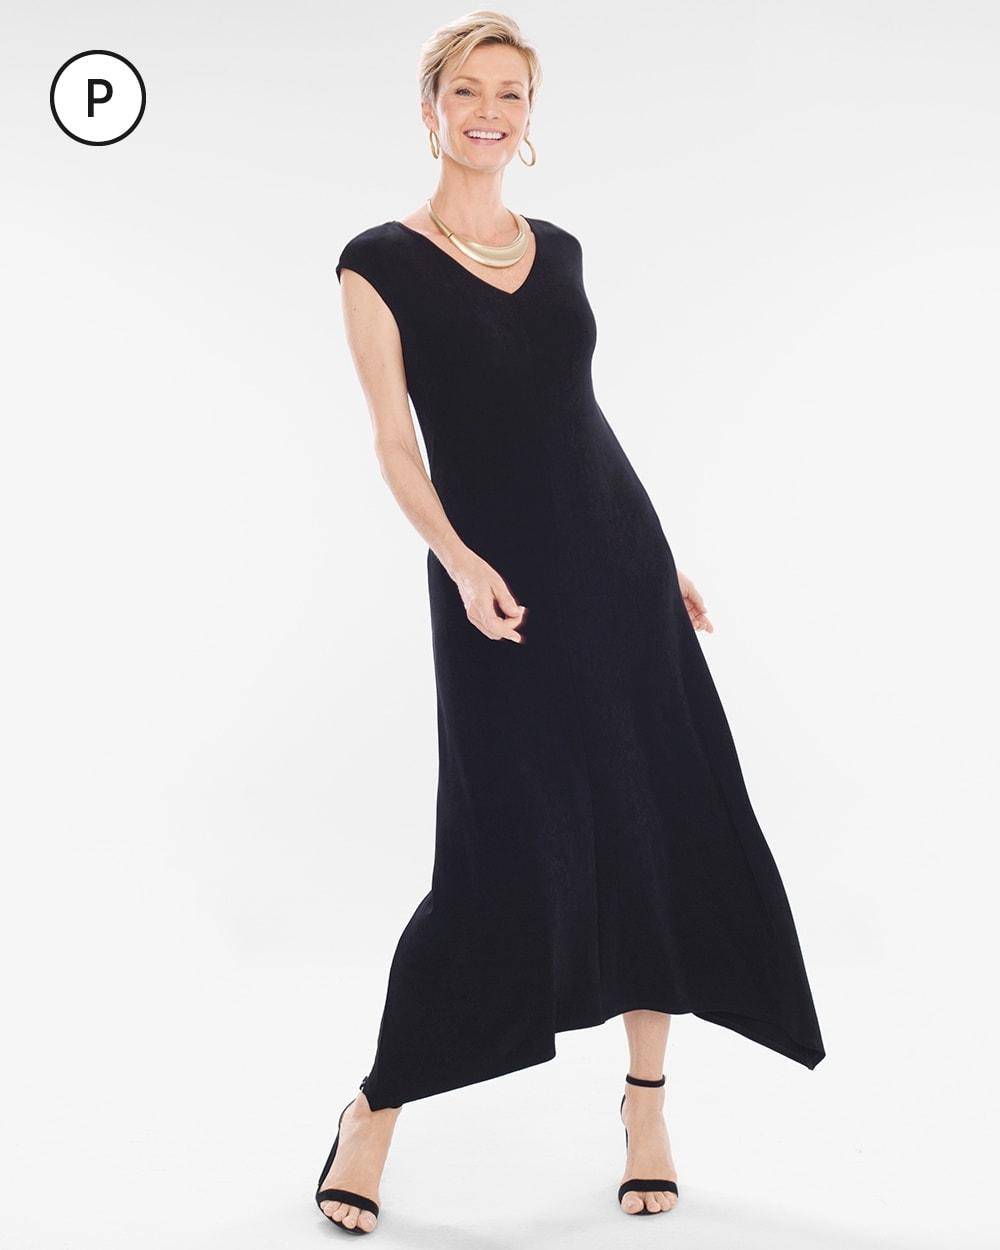 Petites Womens Petite Dresses Skirts Chicos